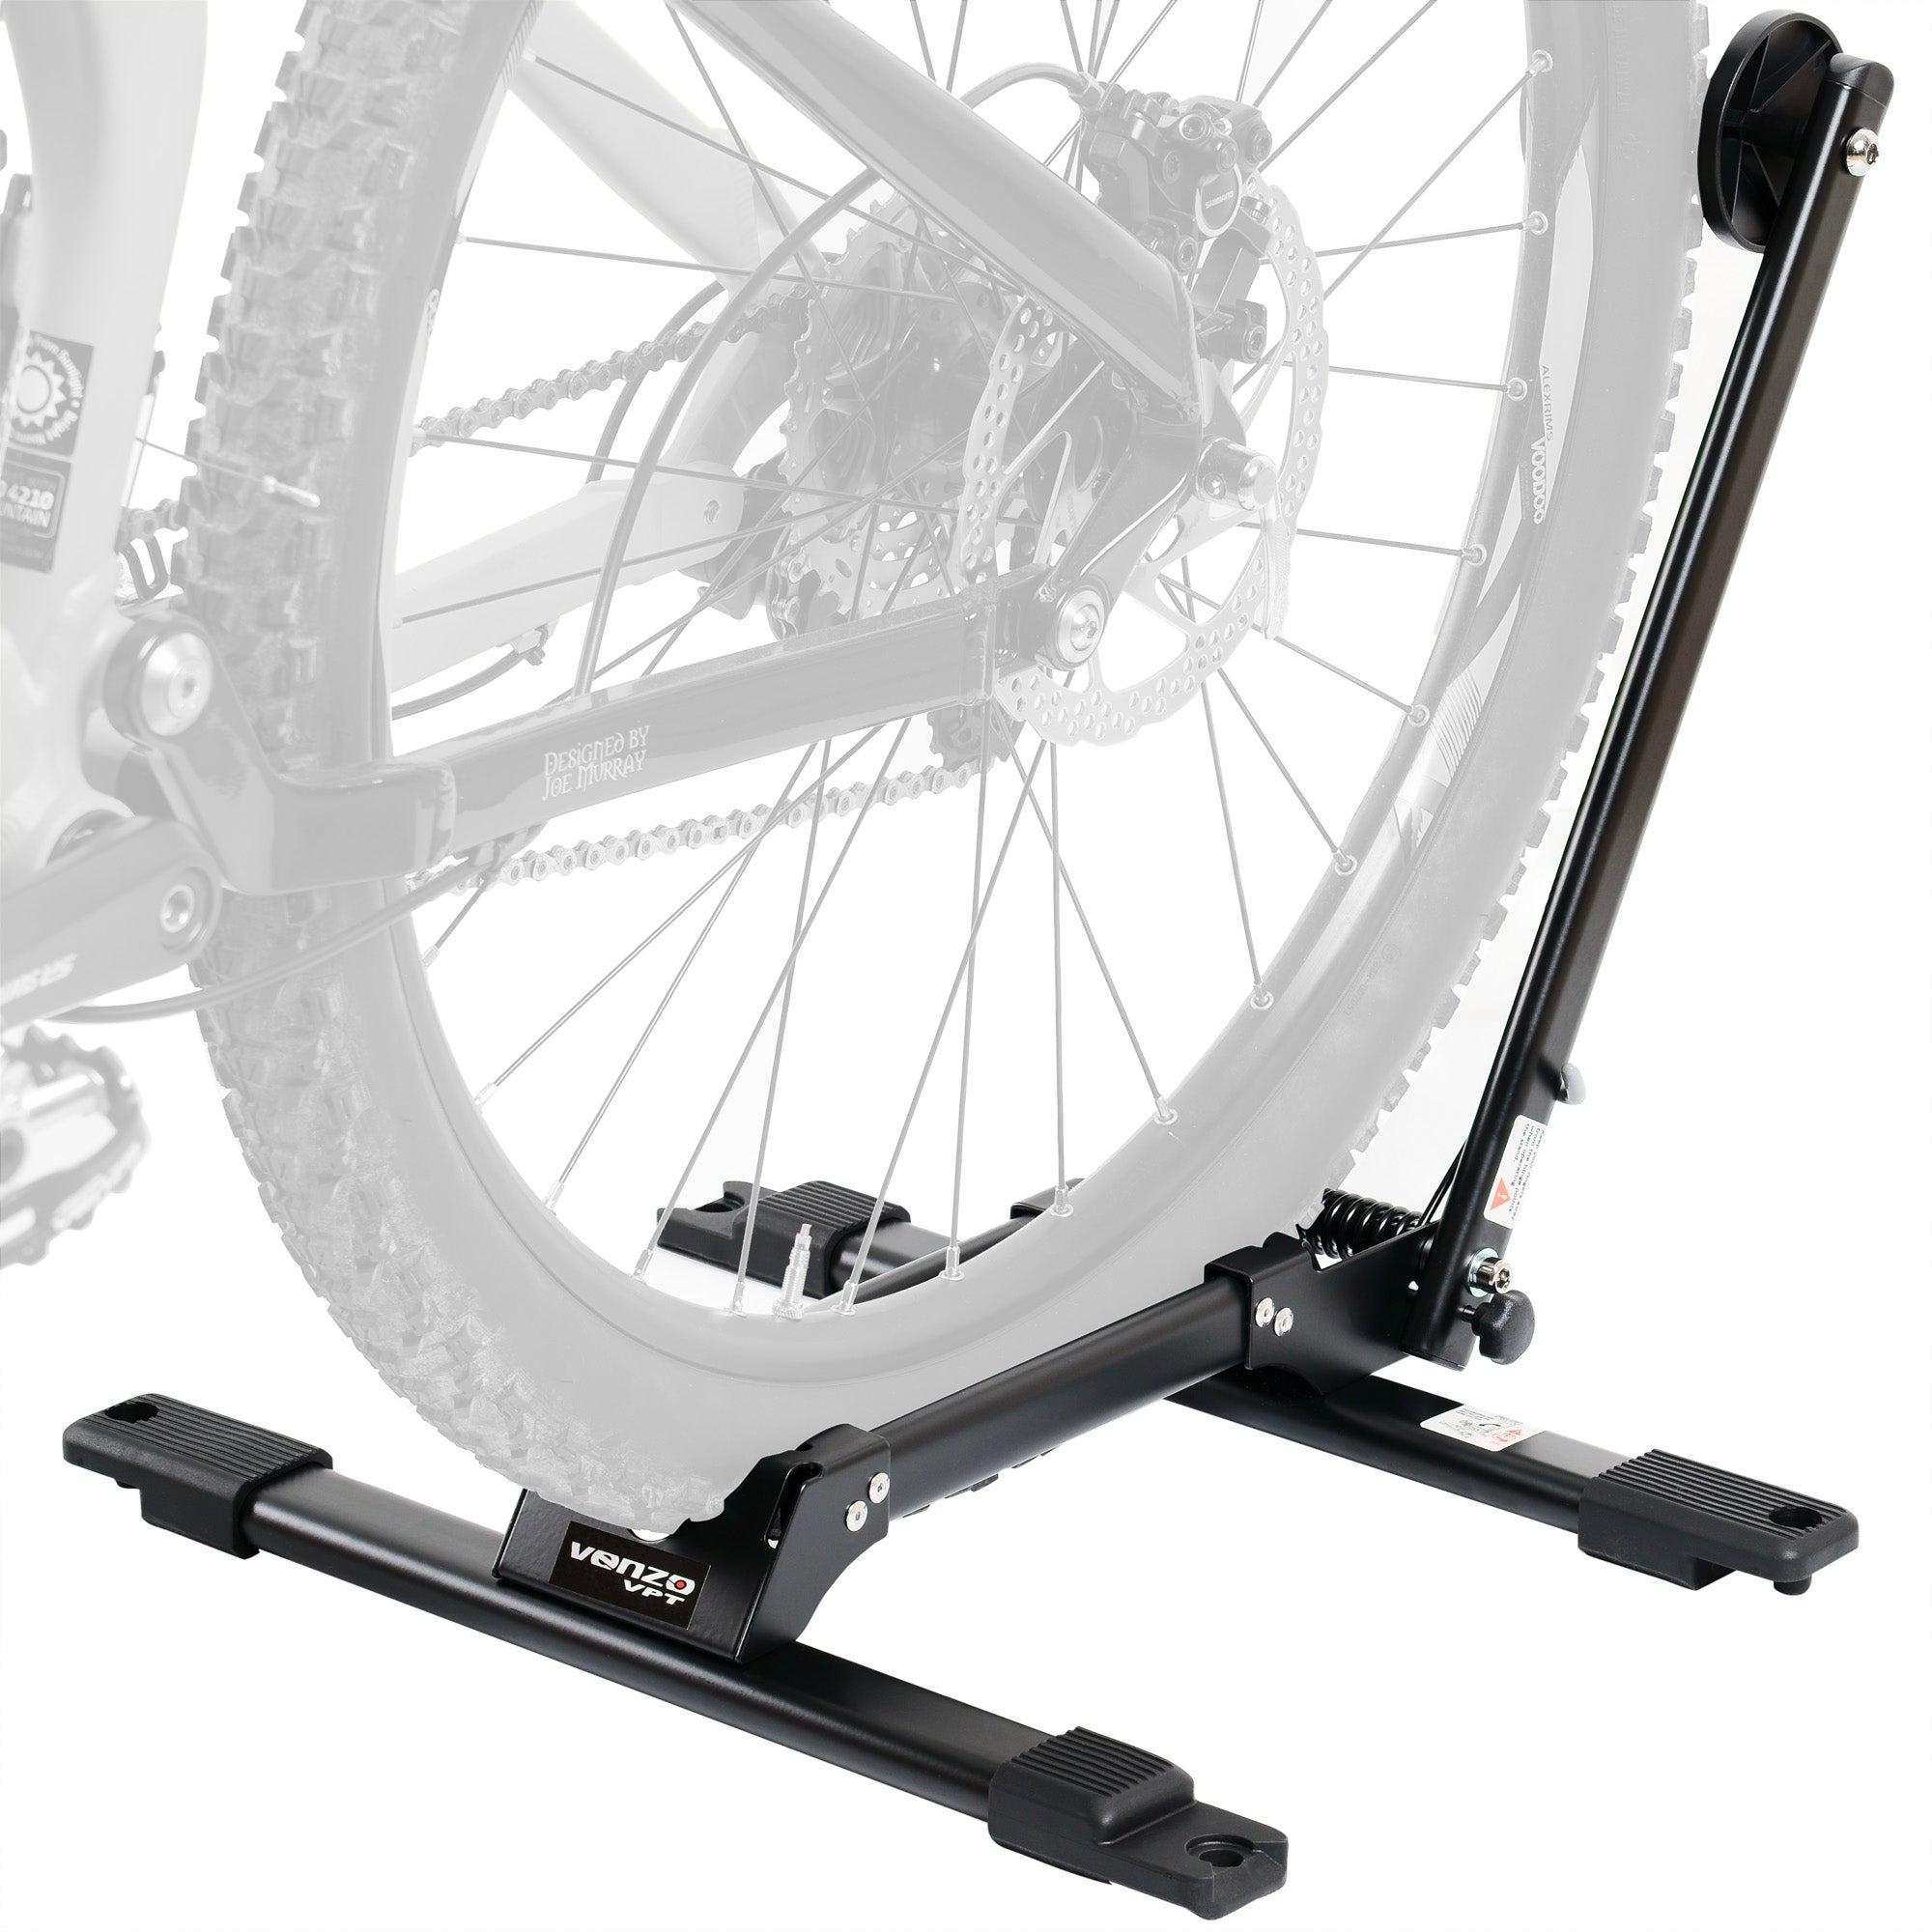 2 x Venzo Bicycle Floor Type Parking Rack Stand - For Mountain and Road Bike Indoor Outdoor Nook Garage Storage - With Connectors